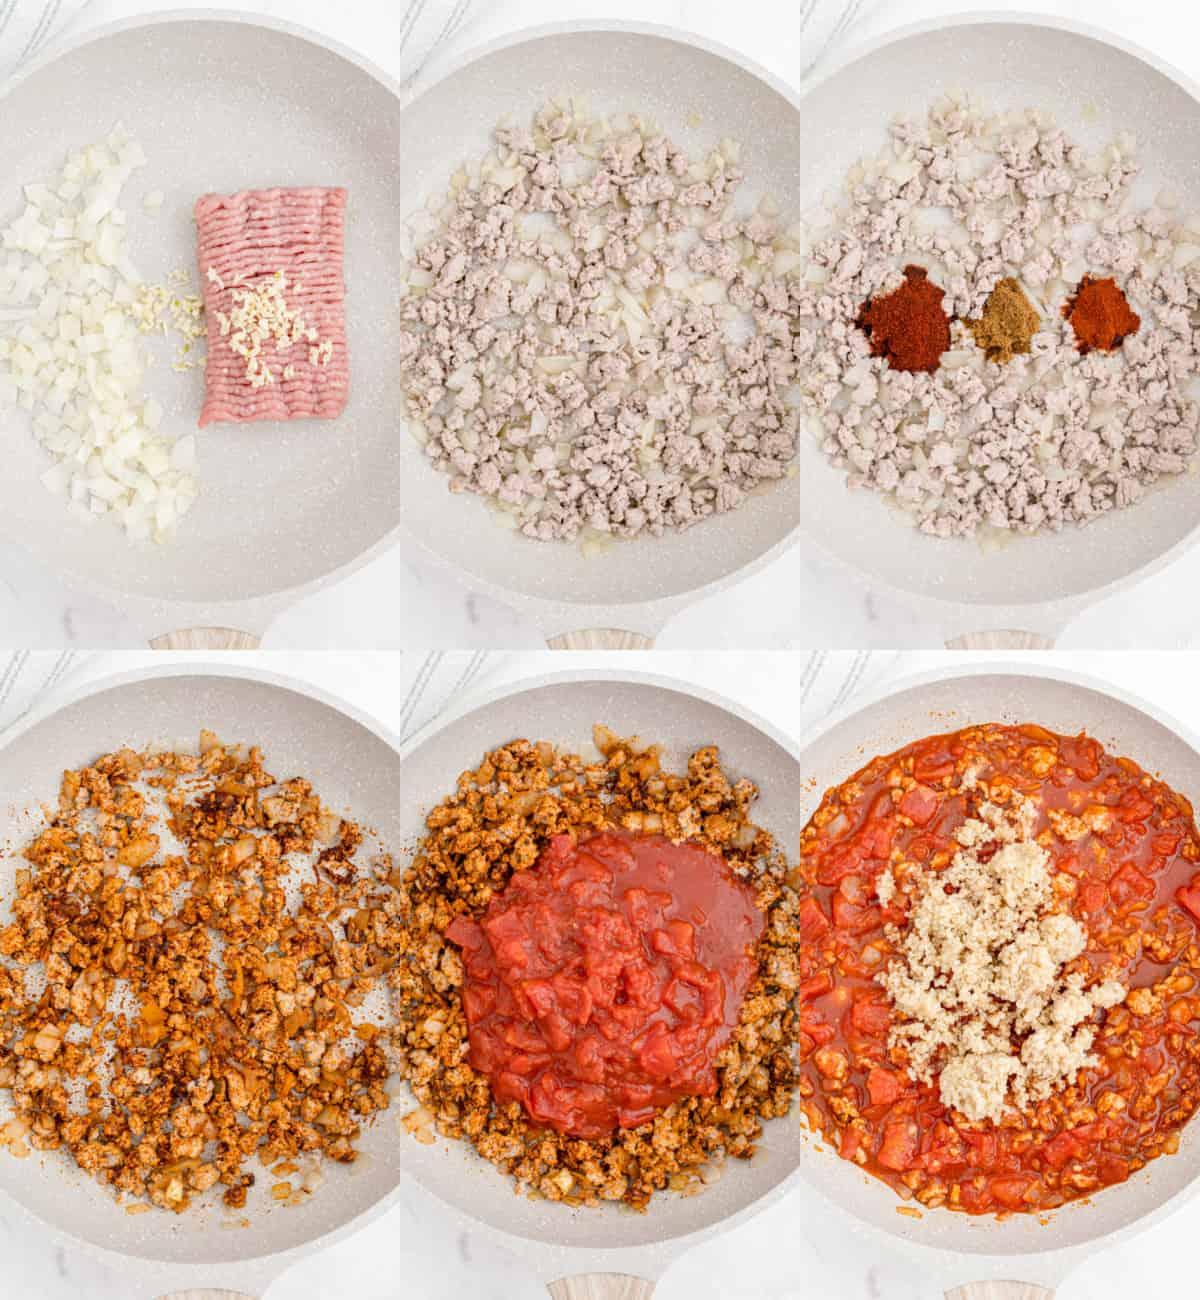 cooking ingredients for pepper filling in skillet